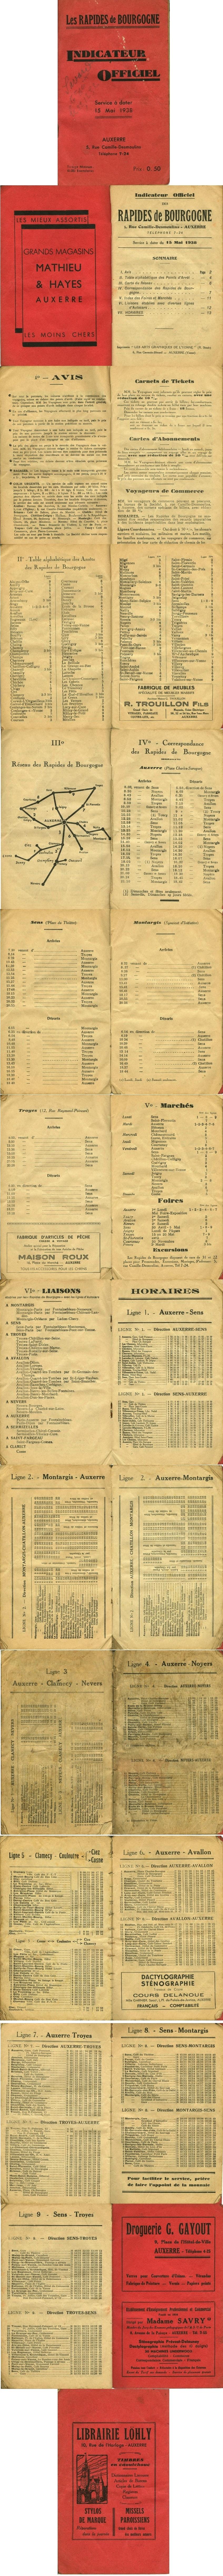 1938 timetable